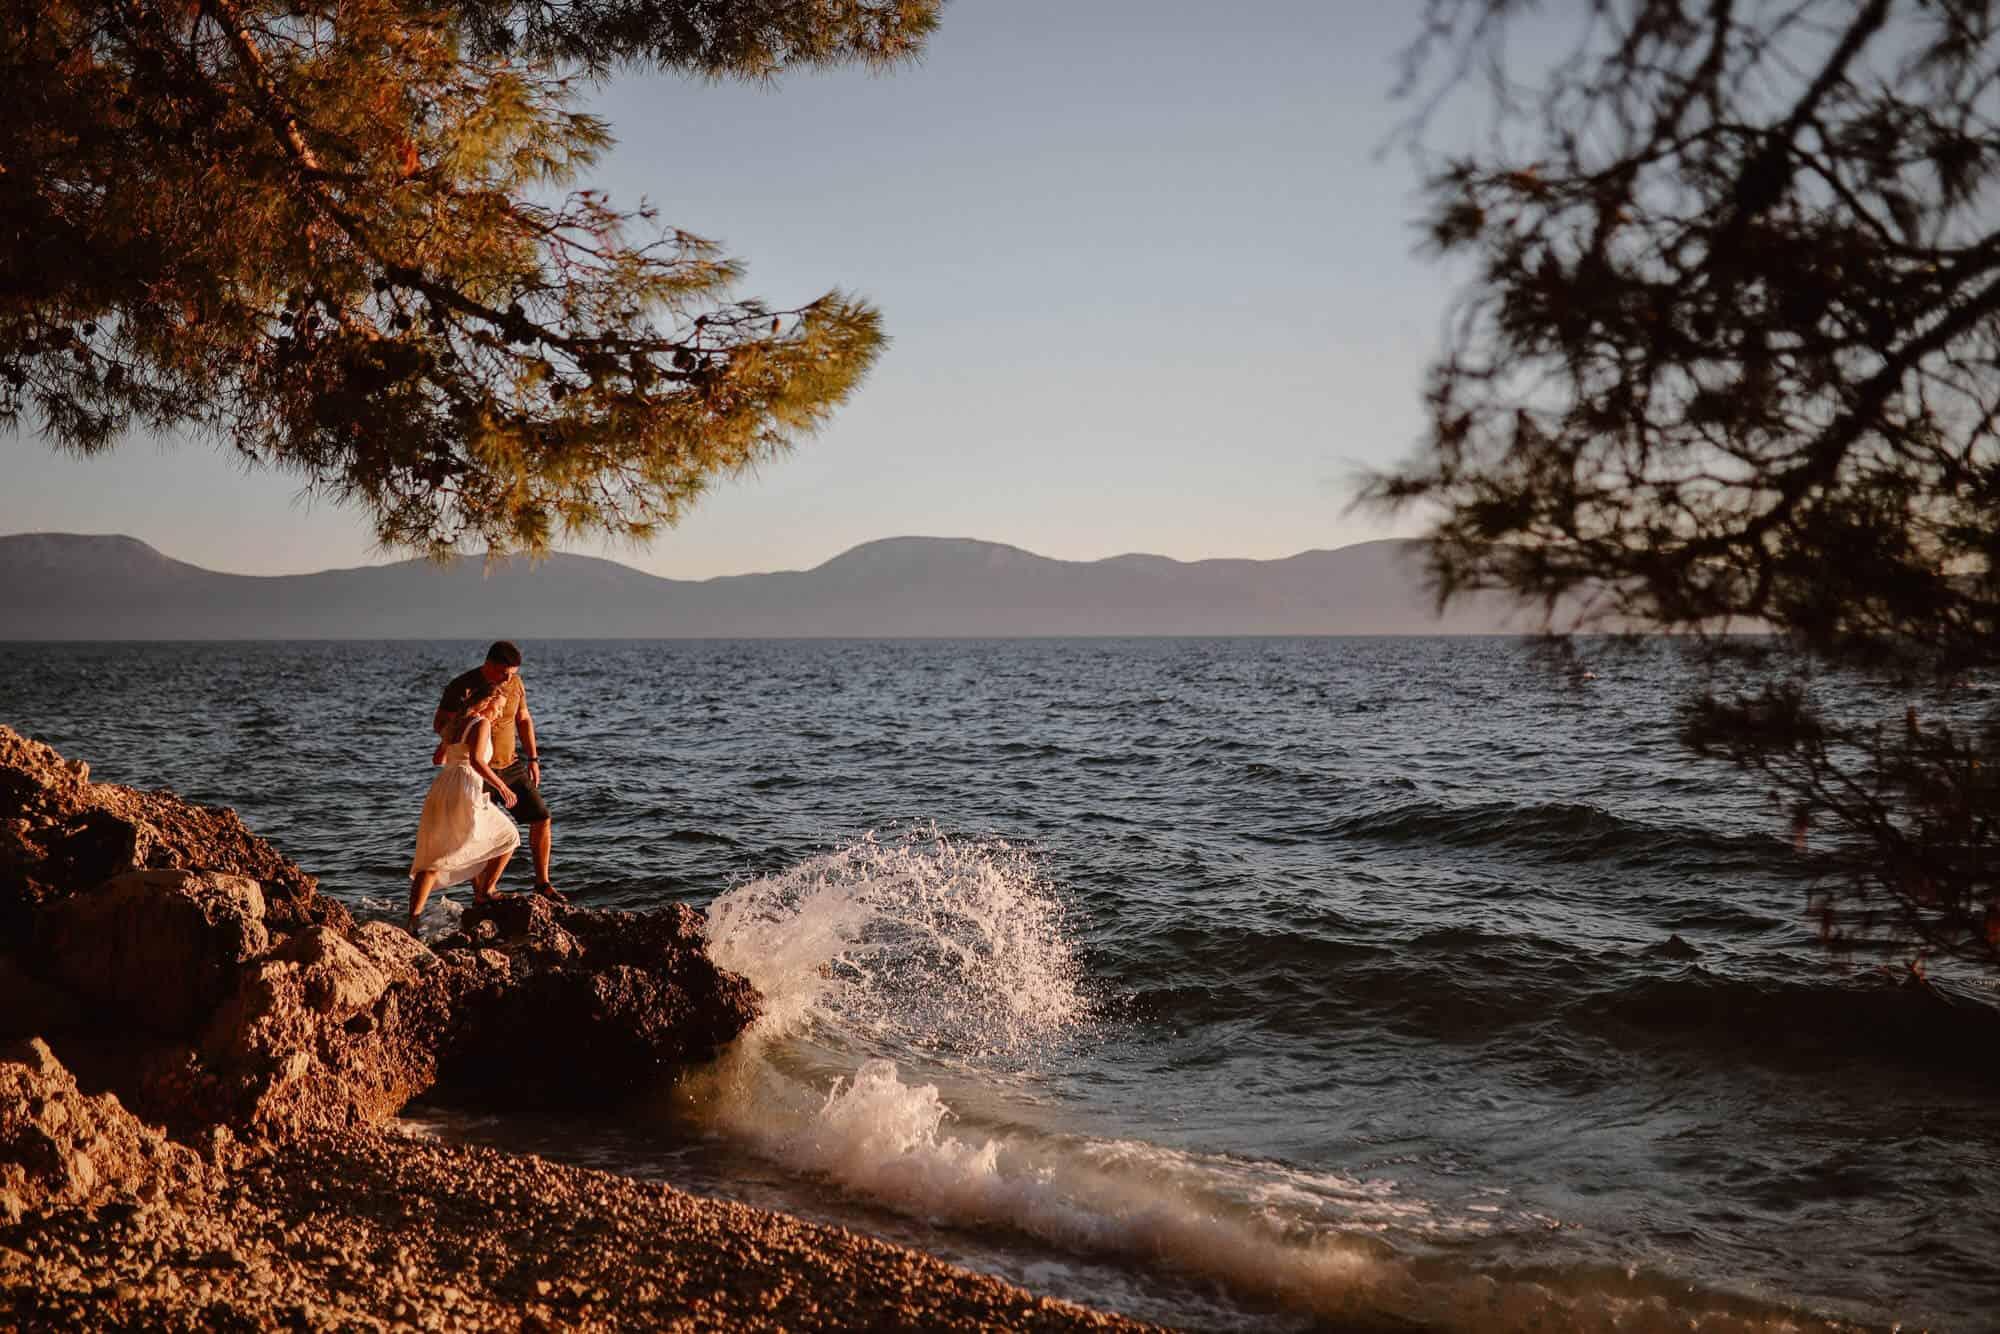 Croatia Elopement Love and Ventures 30 | Croatia Elopement Photographer and Videographer